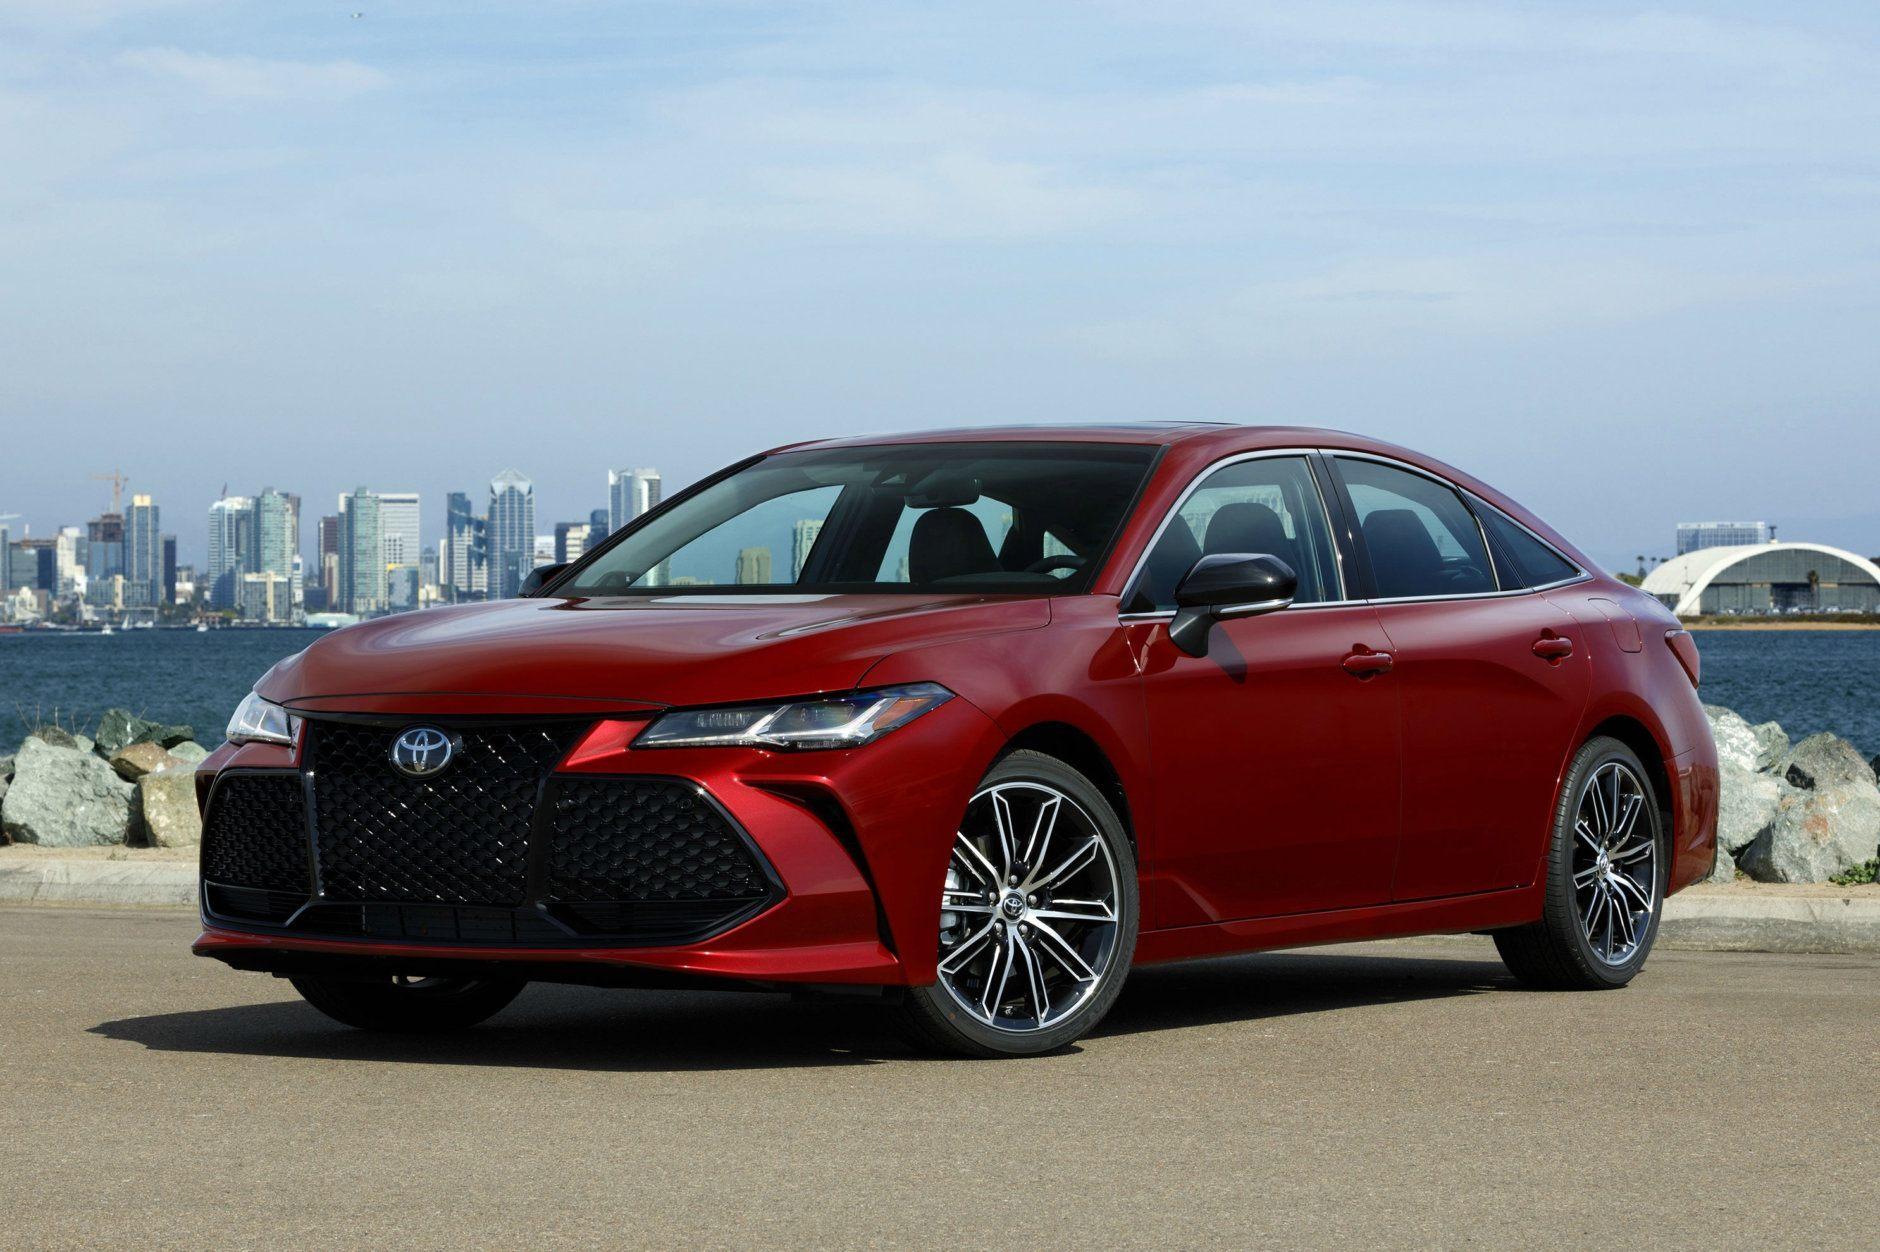 2019 Toyota Avalon Purchase Deal: $3,000 cash back (Courtesy Toyota Motor Sales USA)